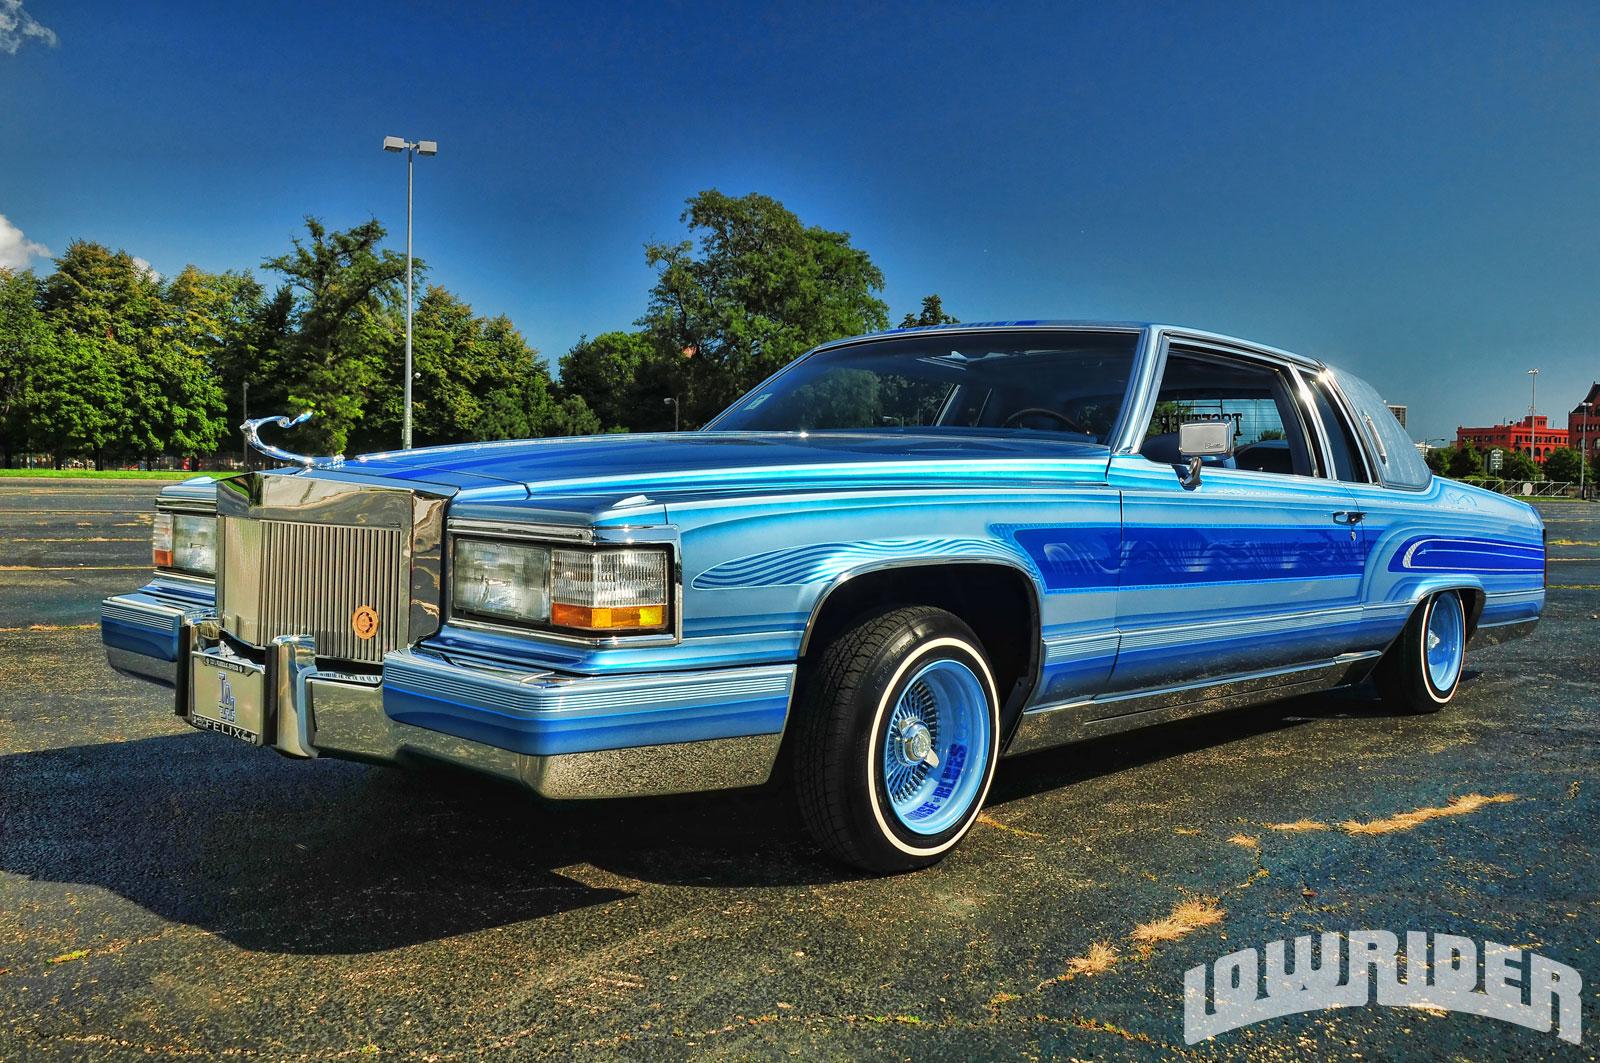 Cadillac Of Naperville >> 1982 Cadillac Coupe De Ville - Lowrider Magazine